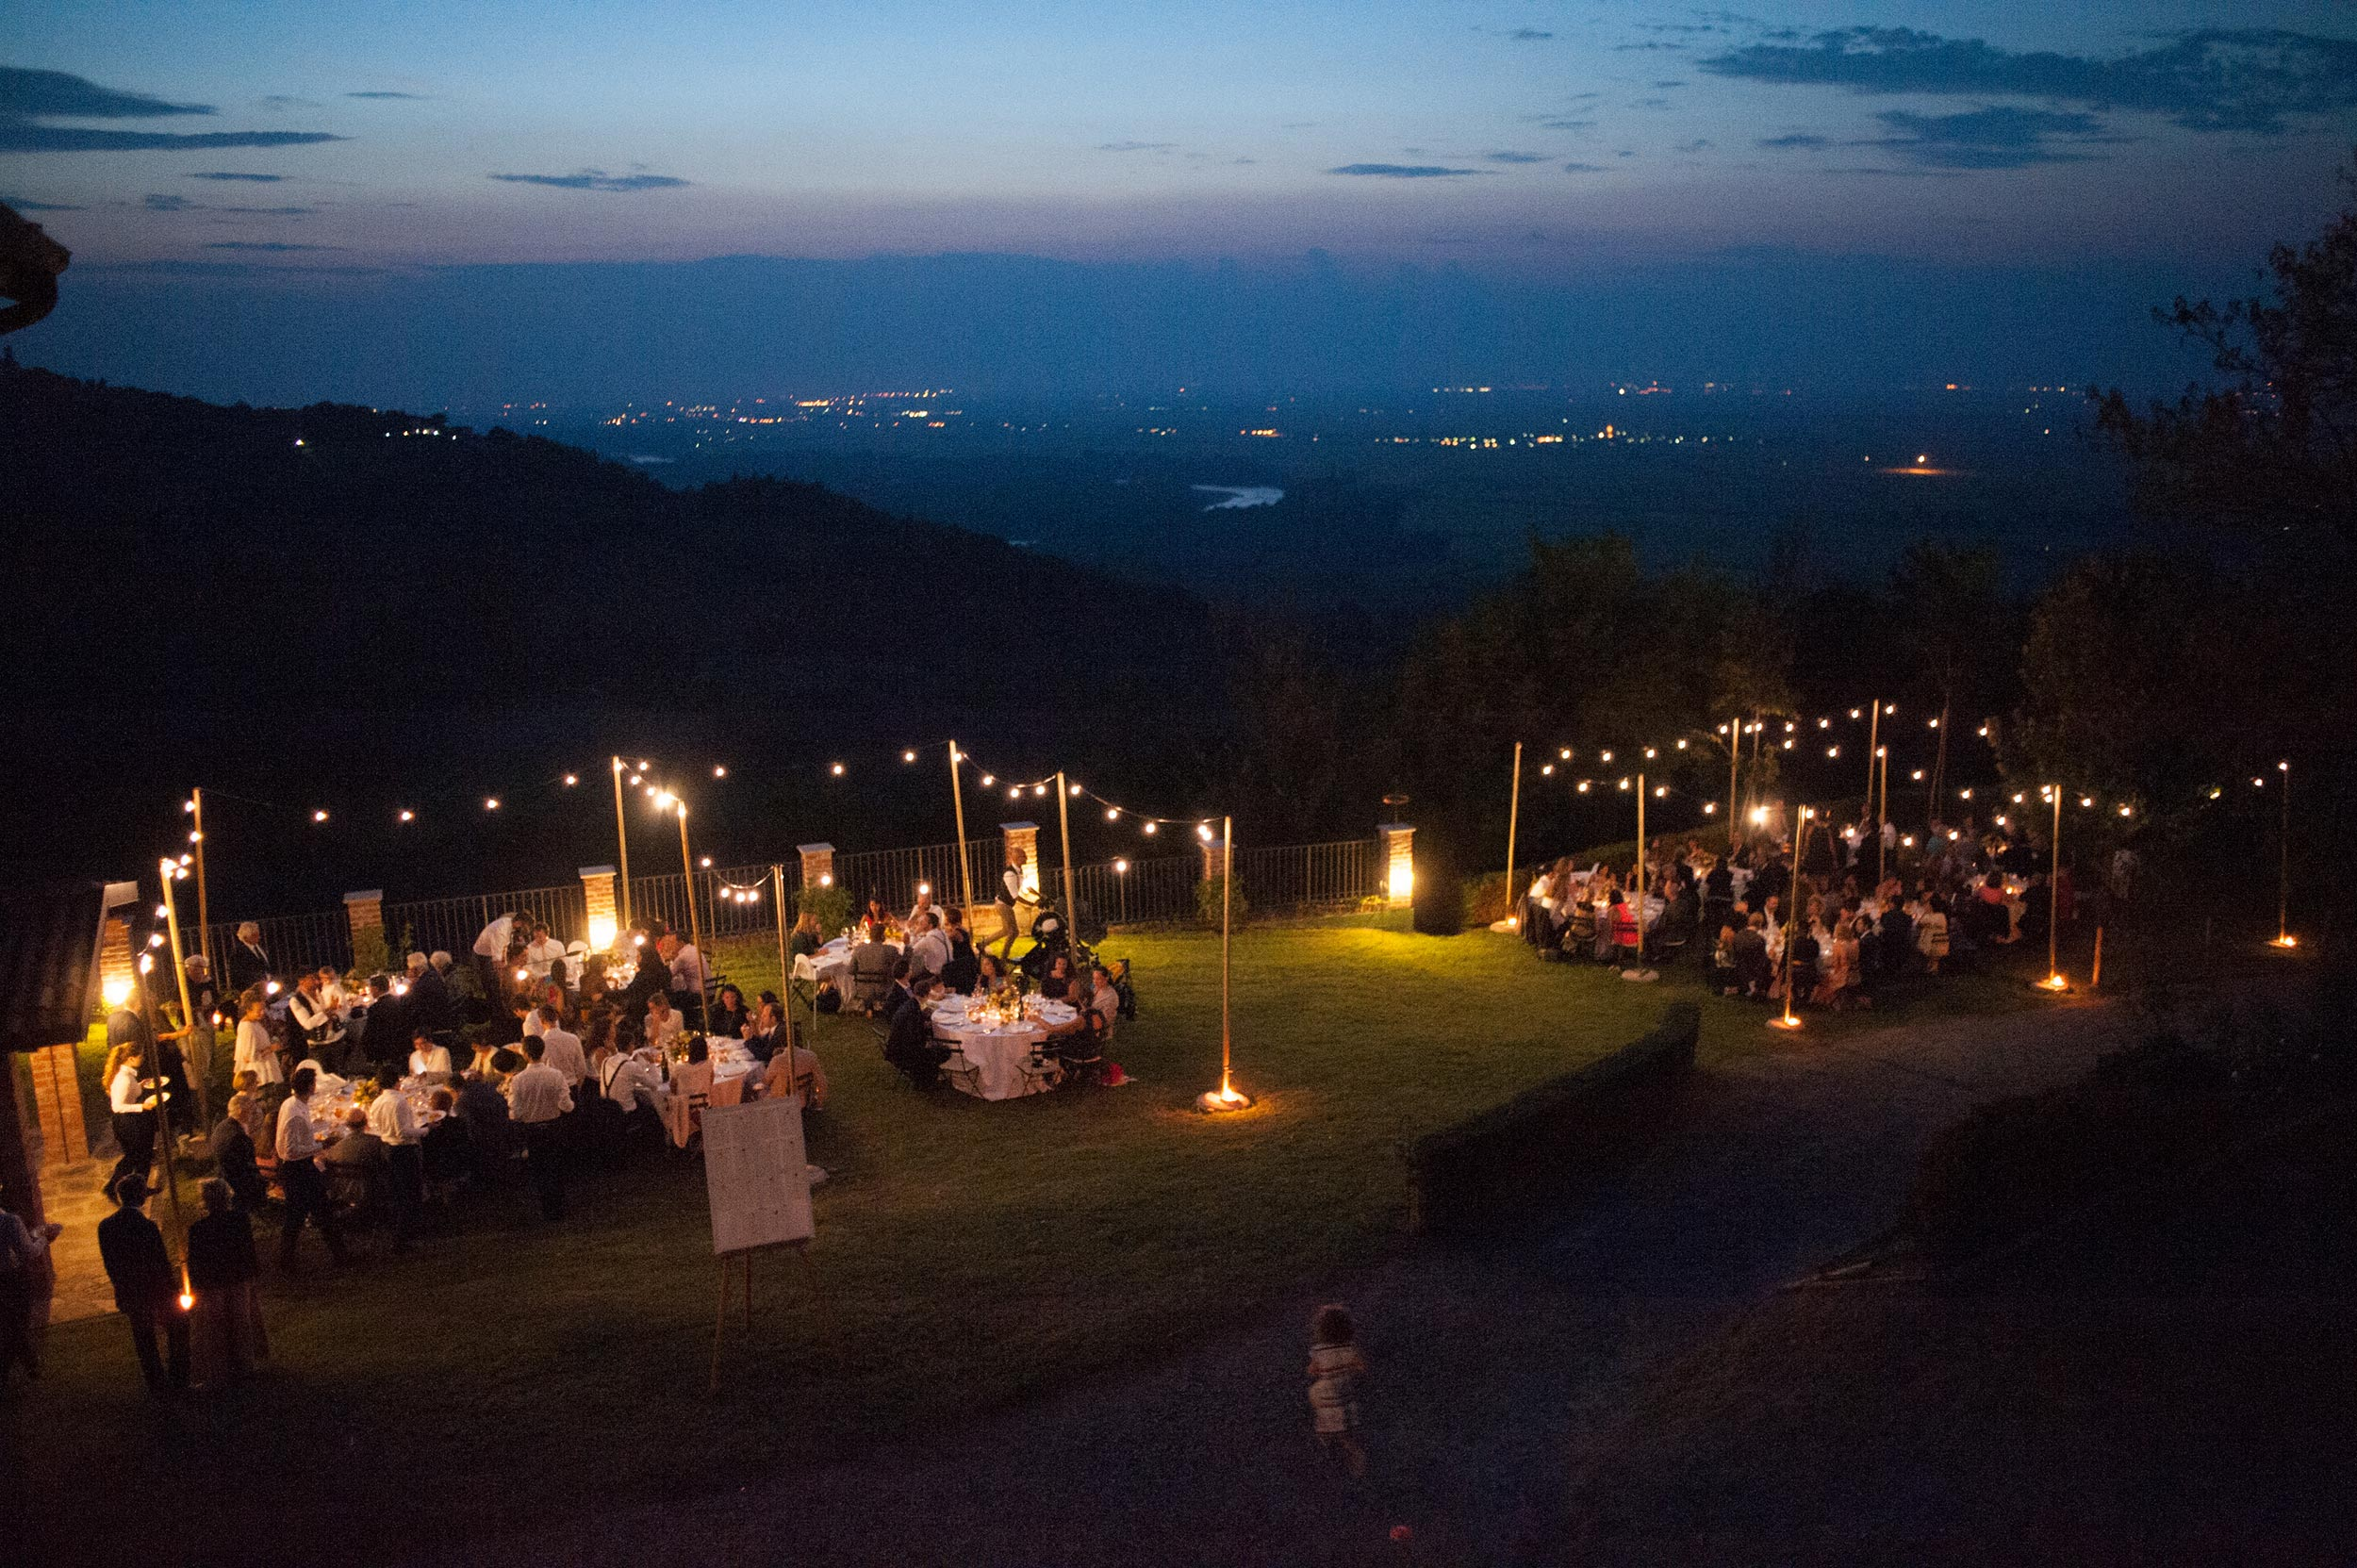 2016-Davor-Chiara-Monferrato-Asti-Vercelli-Wedding-Photographer-Italy-Alessandro-Avenali-69.jpg